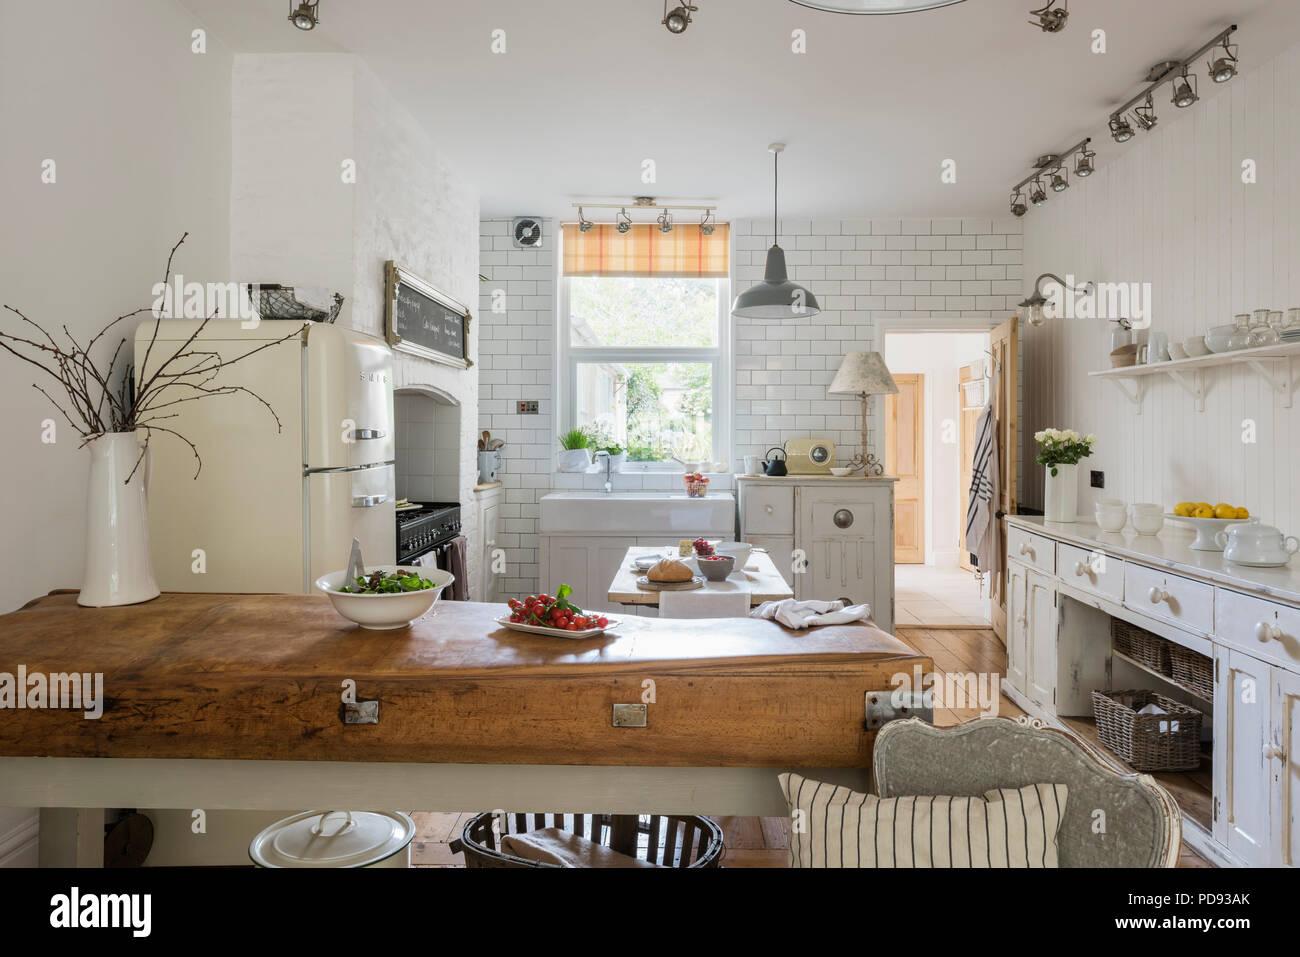 Cucina, stile rustico con un contemporaneo / bordo ...